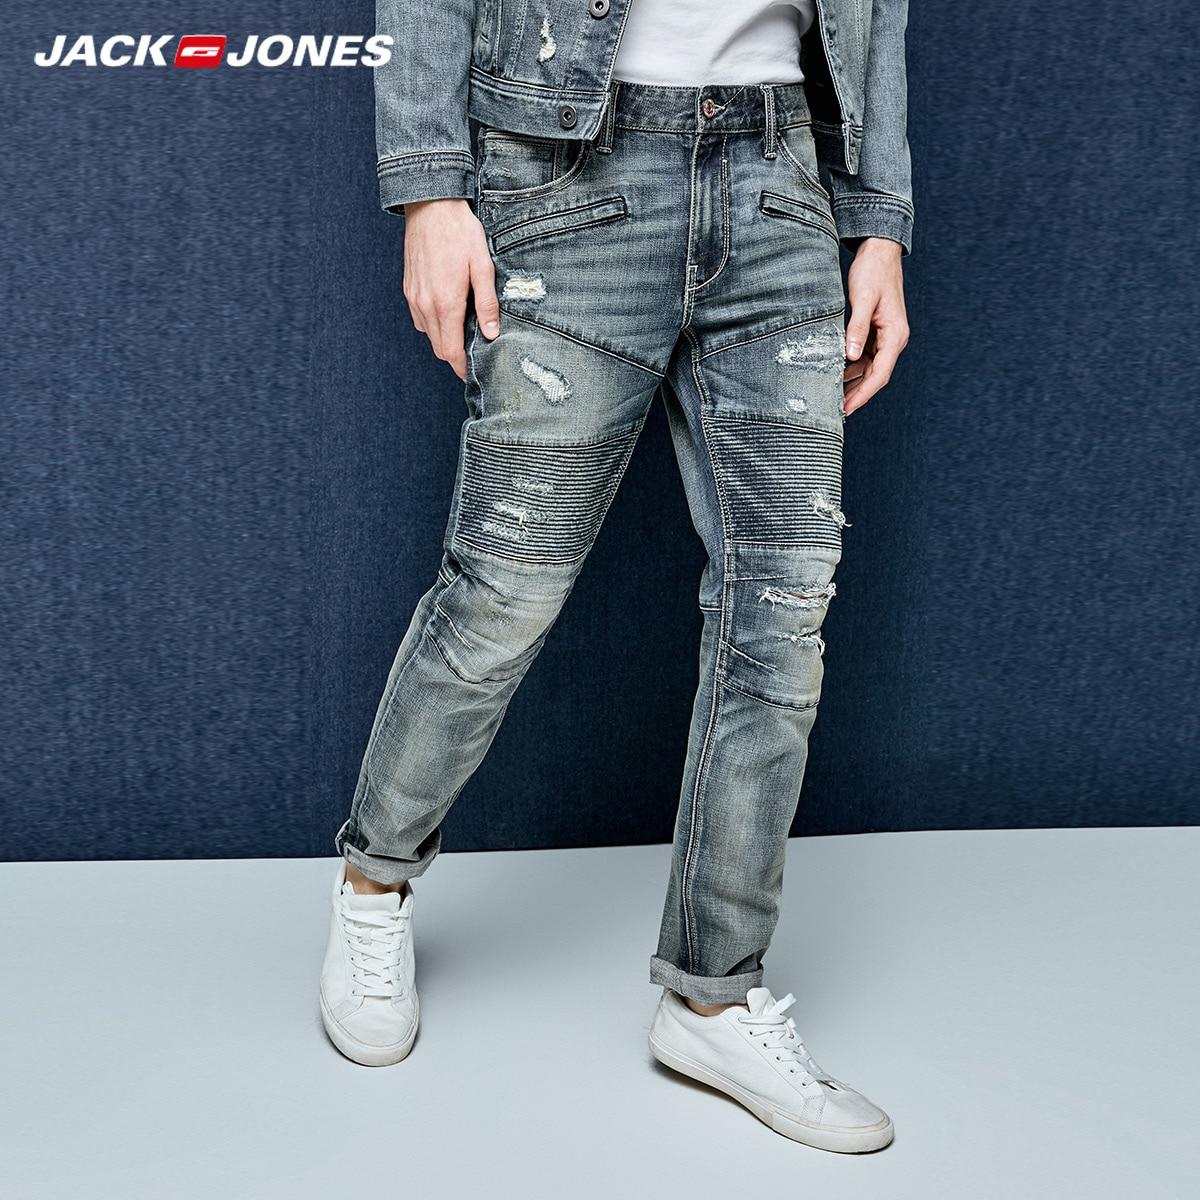 JackJones Men's Ripped Splice Distressed Stretch   Jeans   Business Casual Stretch Slim Classic Trousers Denim Pants JO|217332555